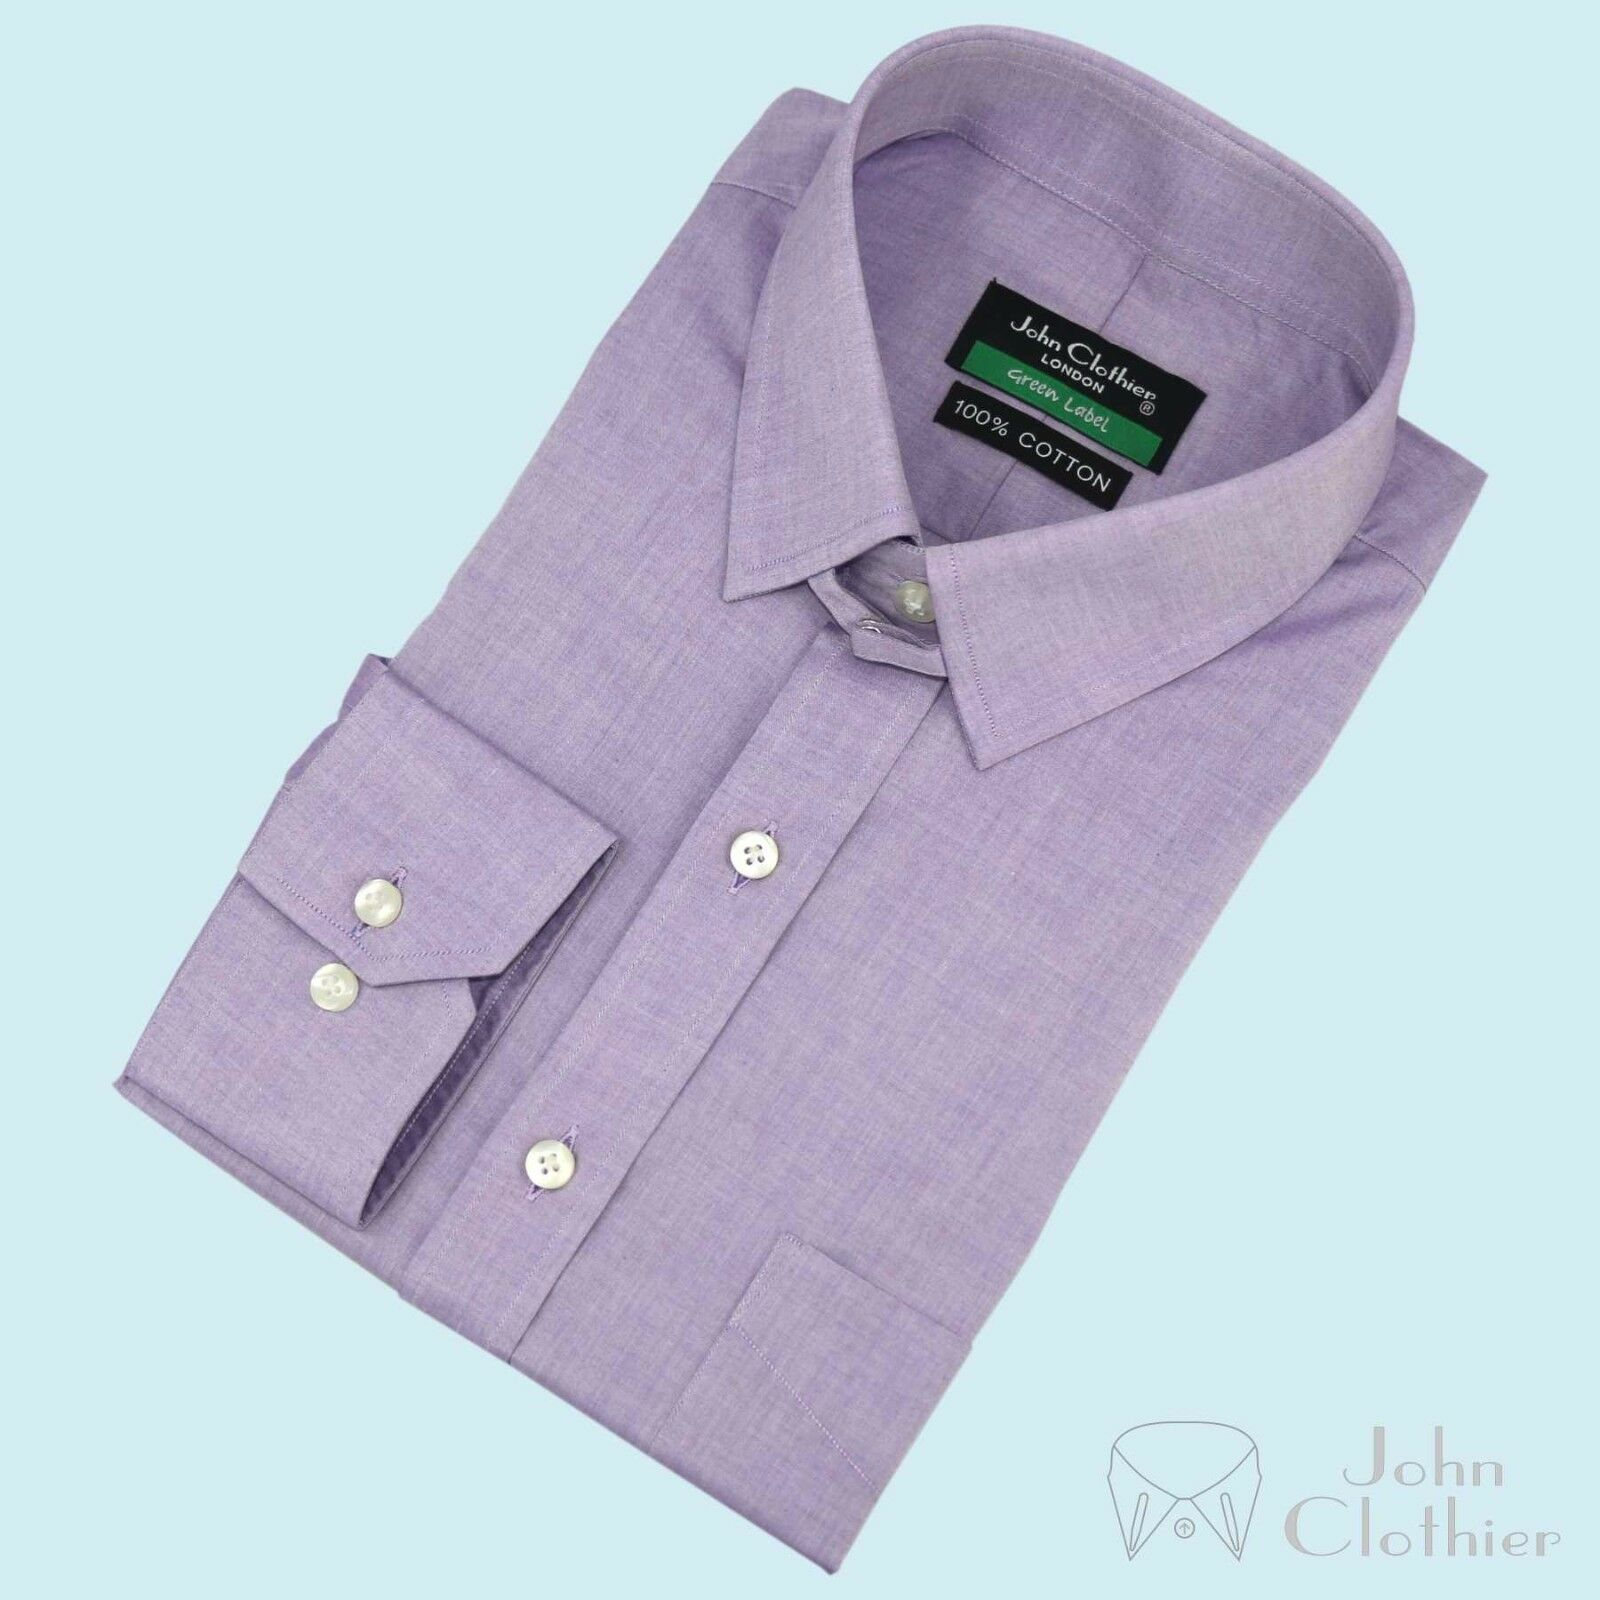 New  Herren Lilac lila Milange shirt James Bond Tab collar Loop for Gents Formal